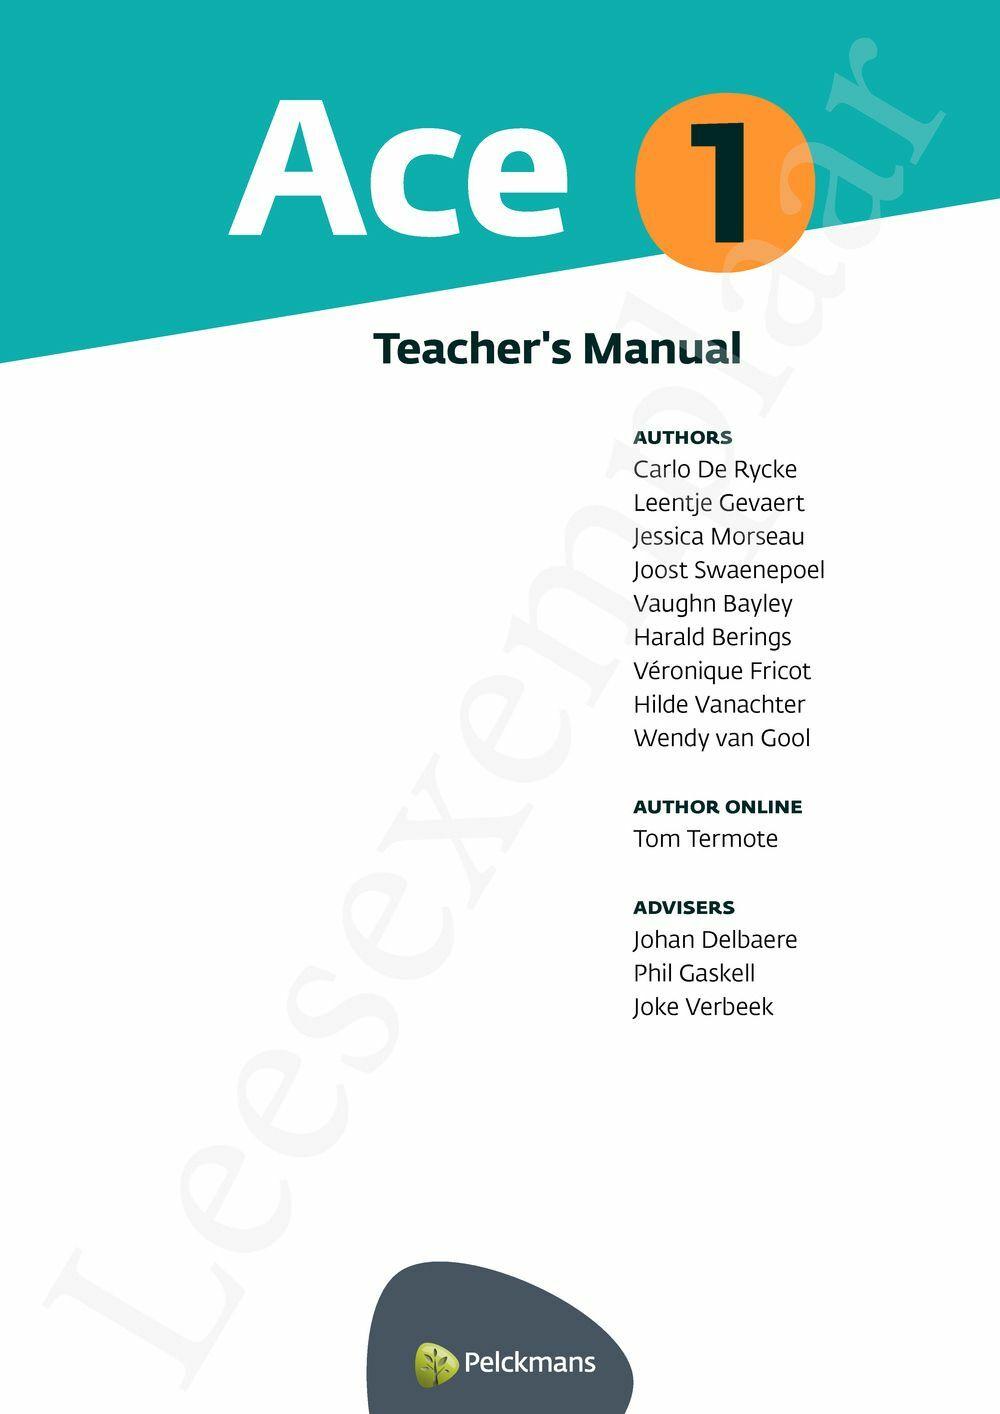 Preview: Ace 1 Teacher's Manual